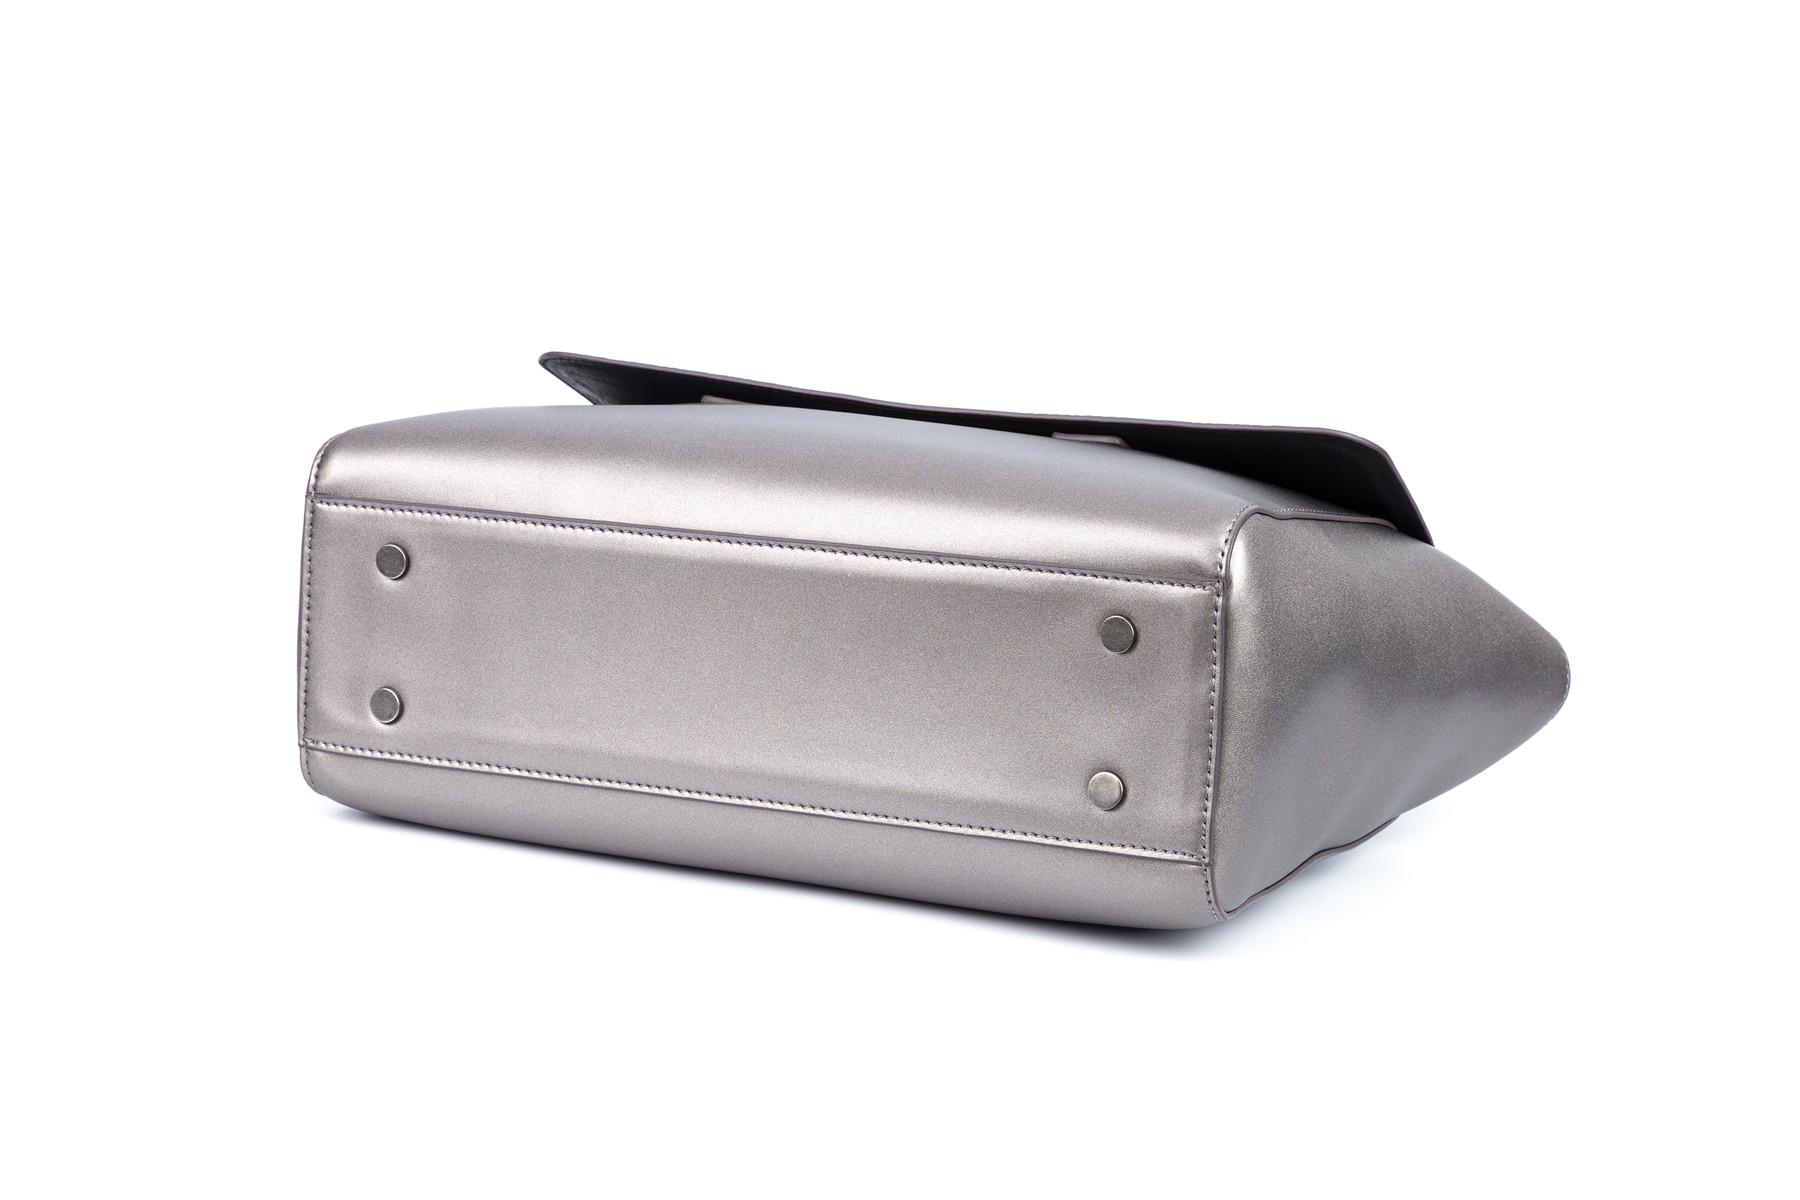 GF bags-Handbag Weaving handle microfiber leather cover closure